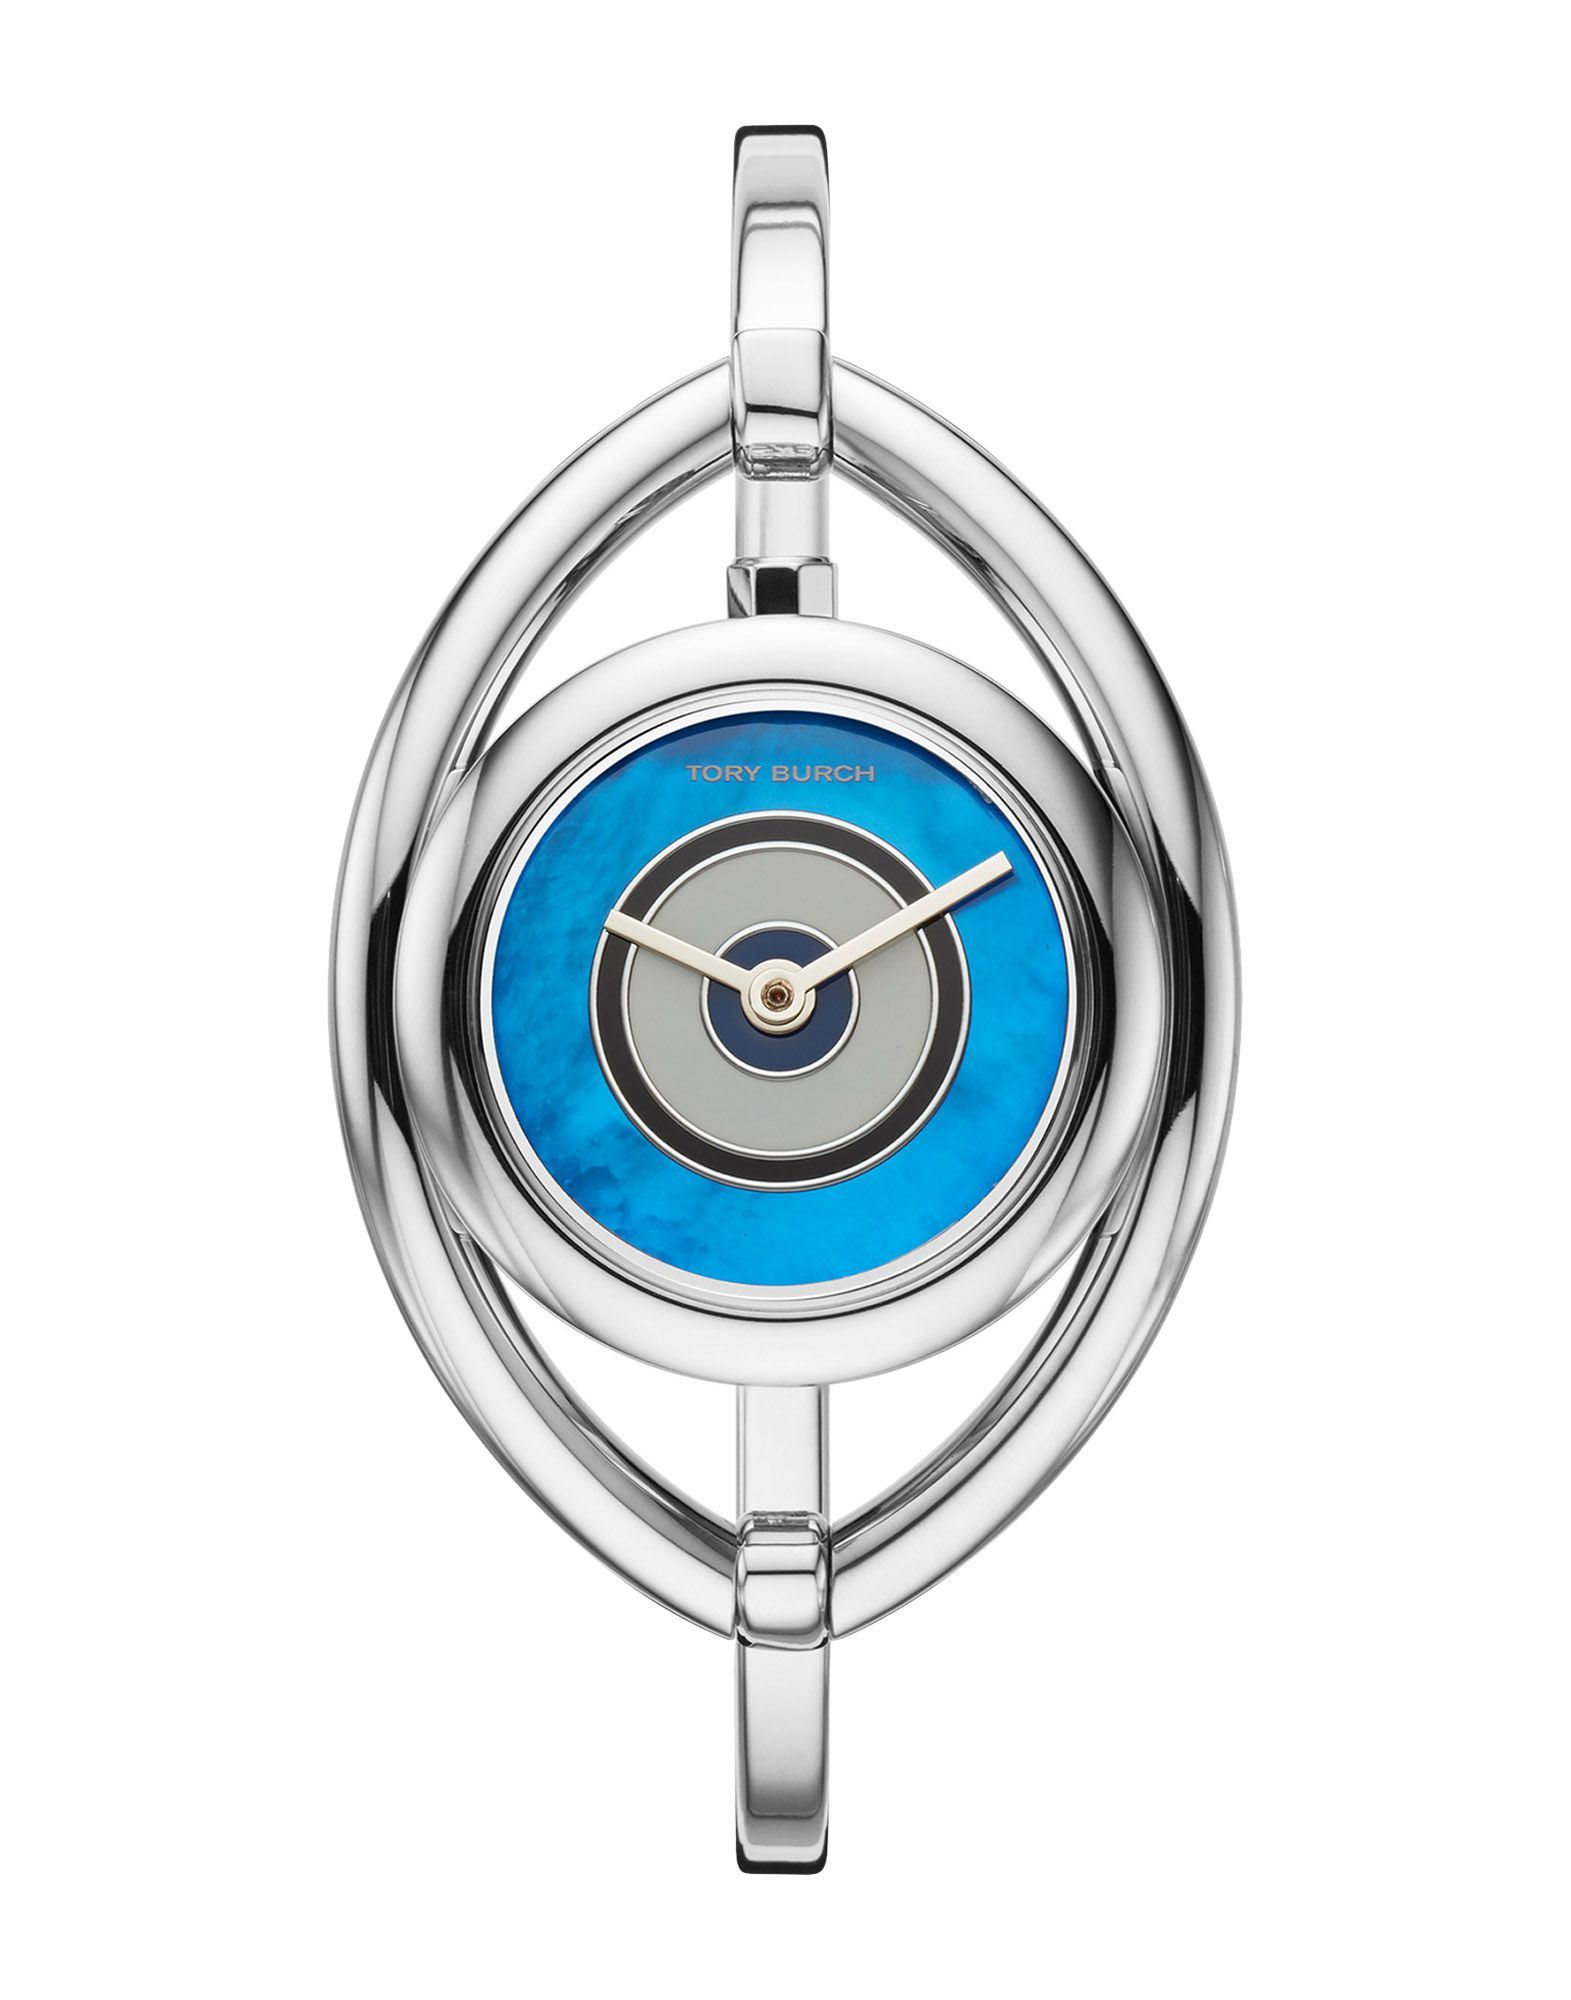 TORY BURCH Wrist watches - Item 58046548